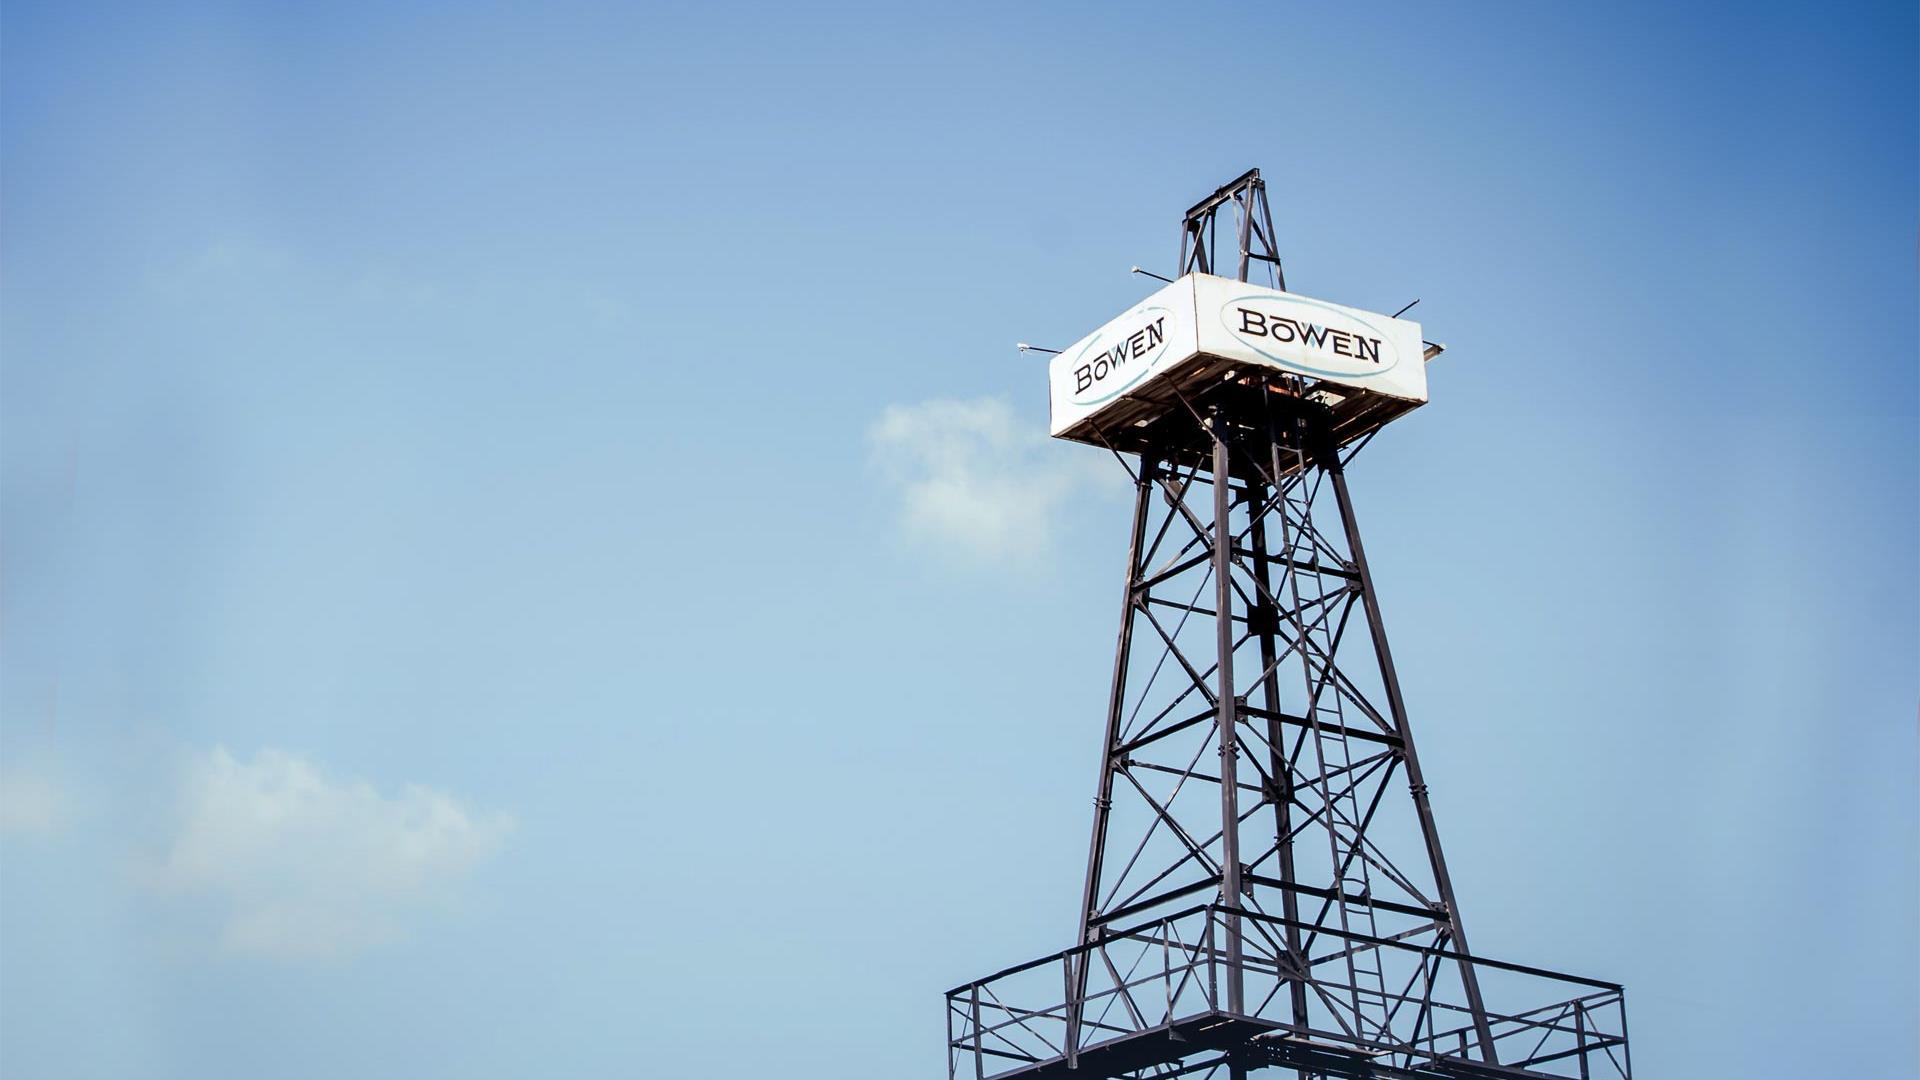 Bowen rig against a blue sky